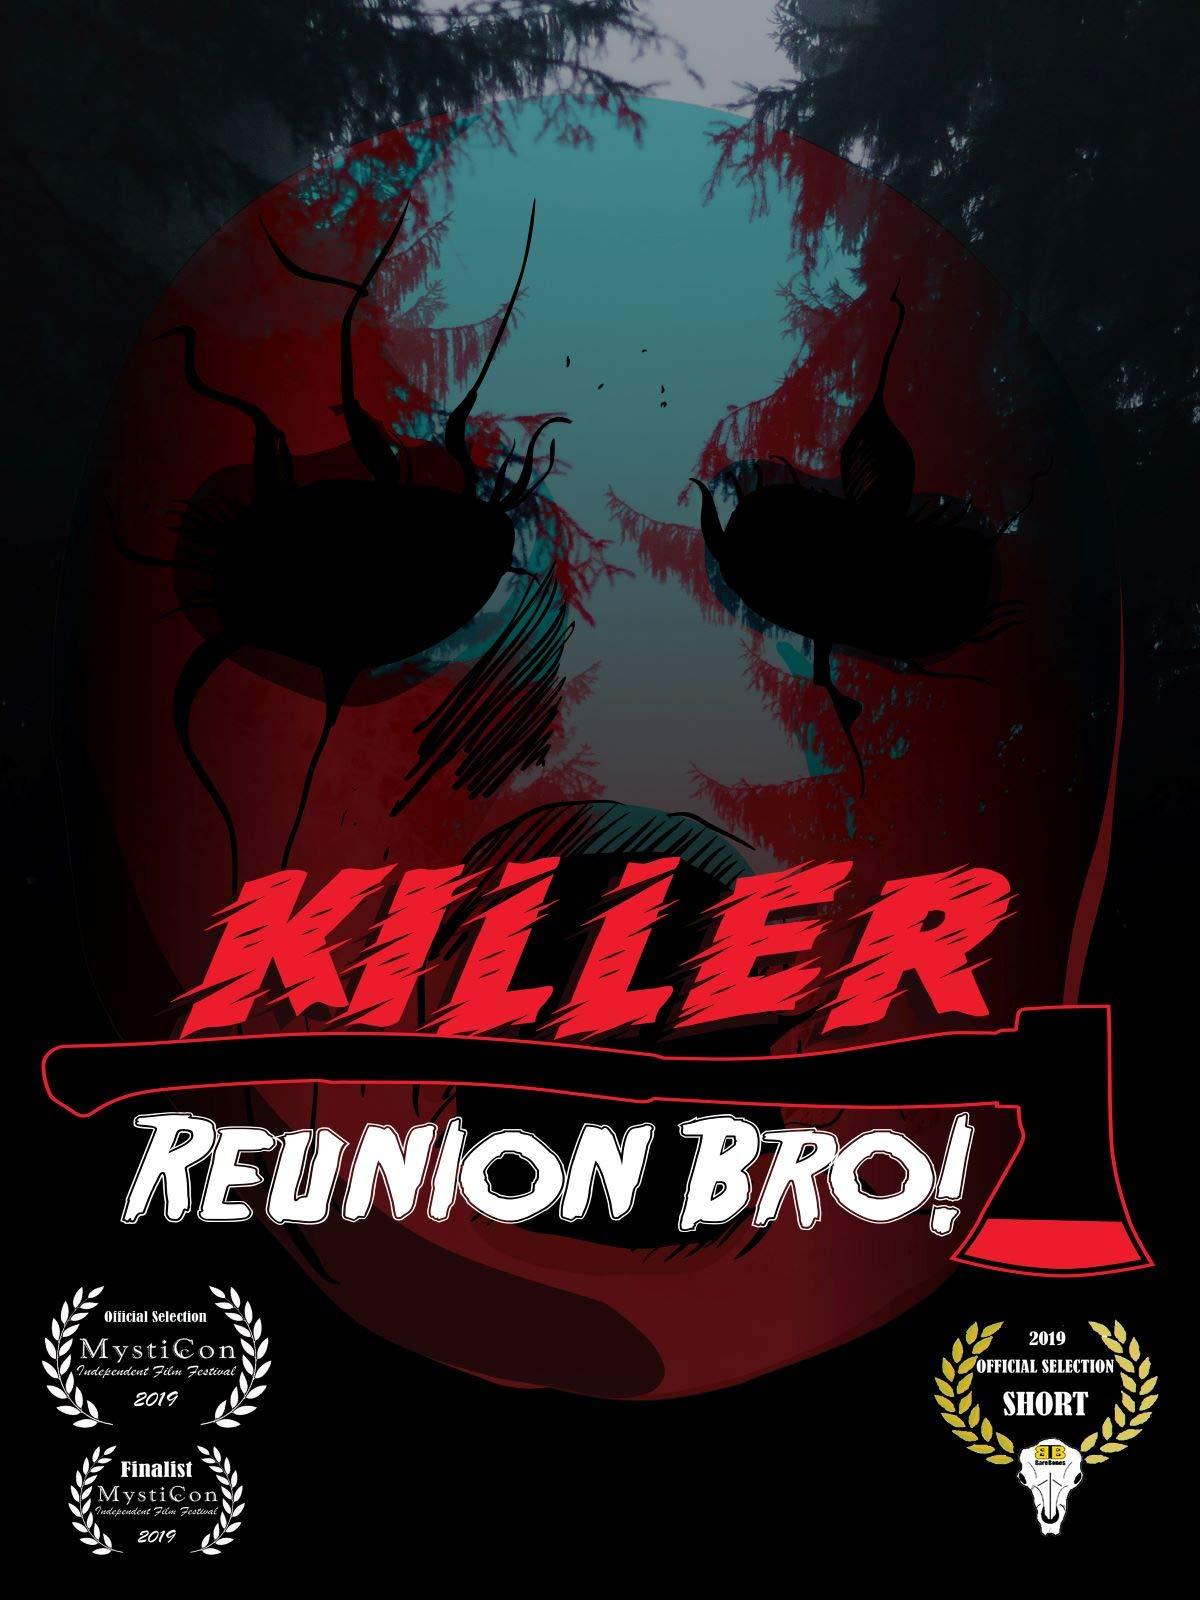 Killer Reunion Bro!